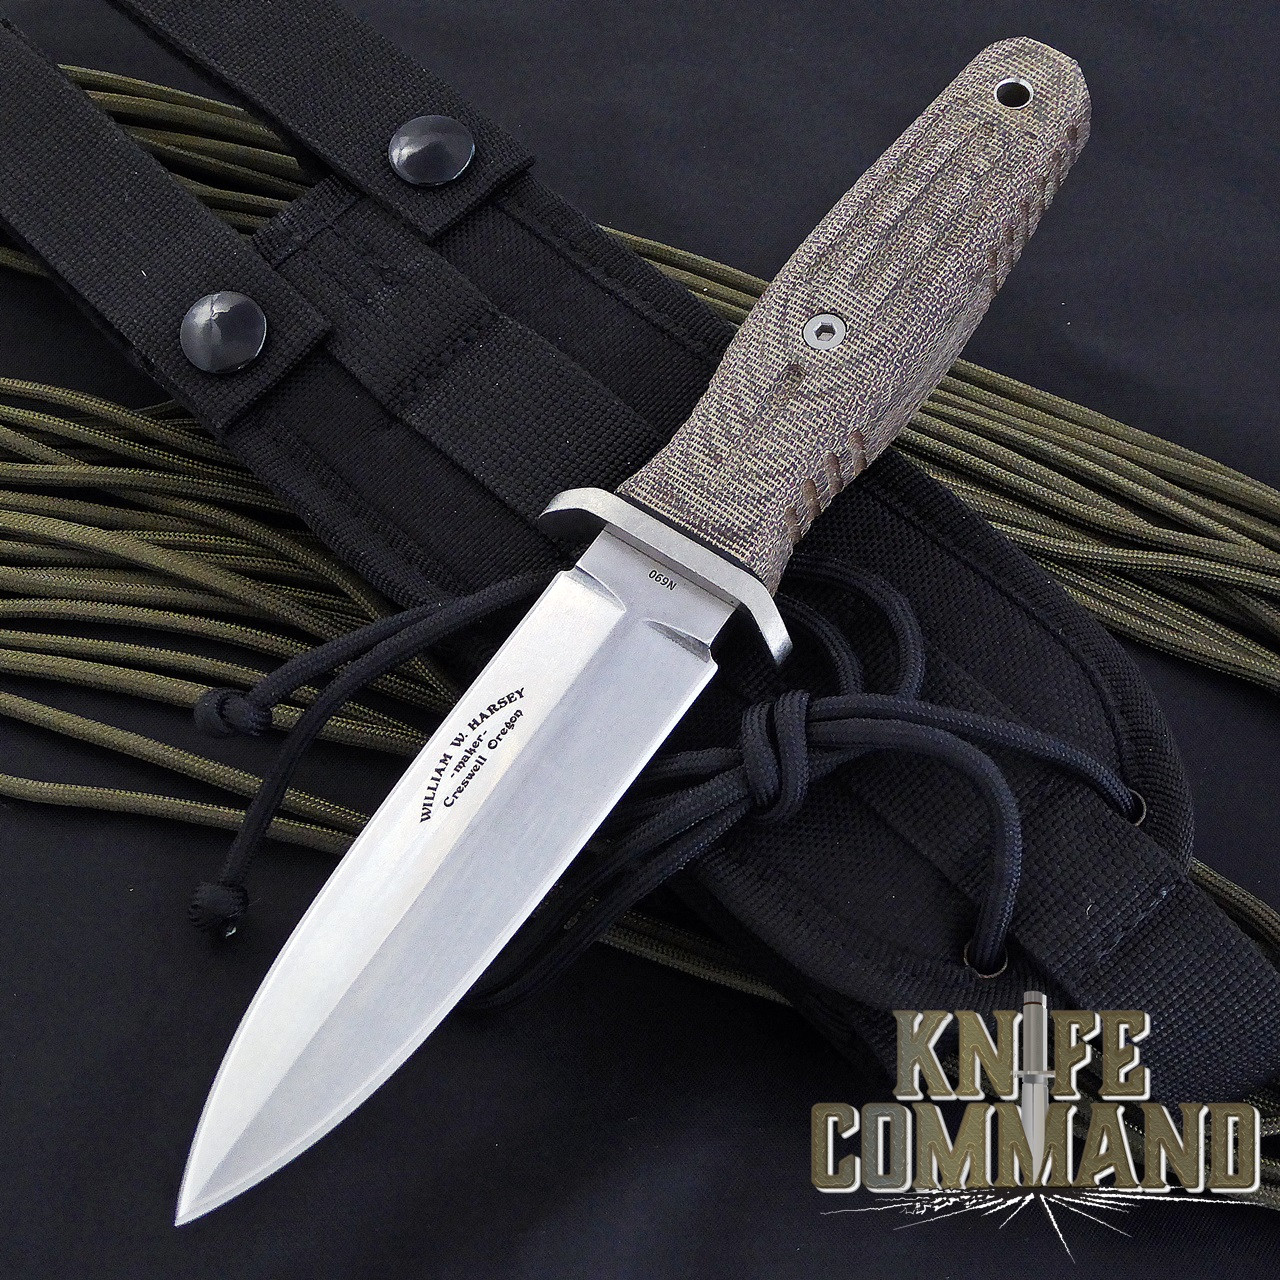 Boker Applegate-Fairbairn A-F 4.5 Harsey Combat Knife 120644.  Green micarta and stonewash blade.